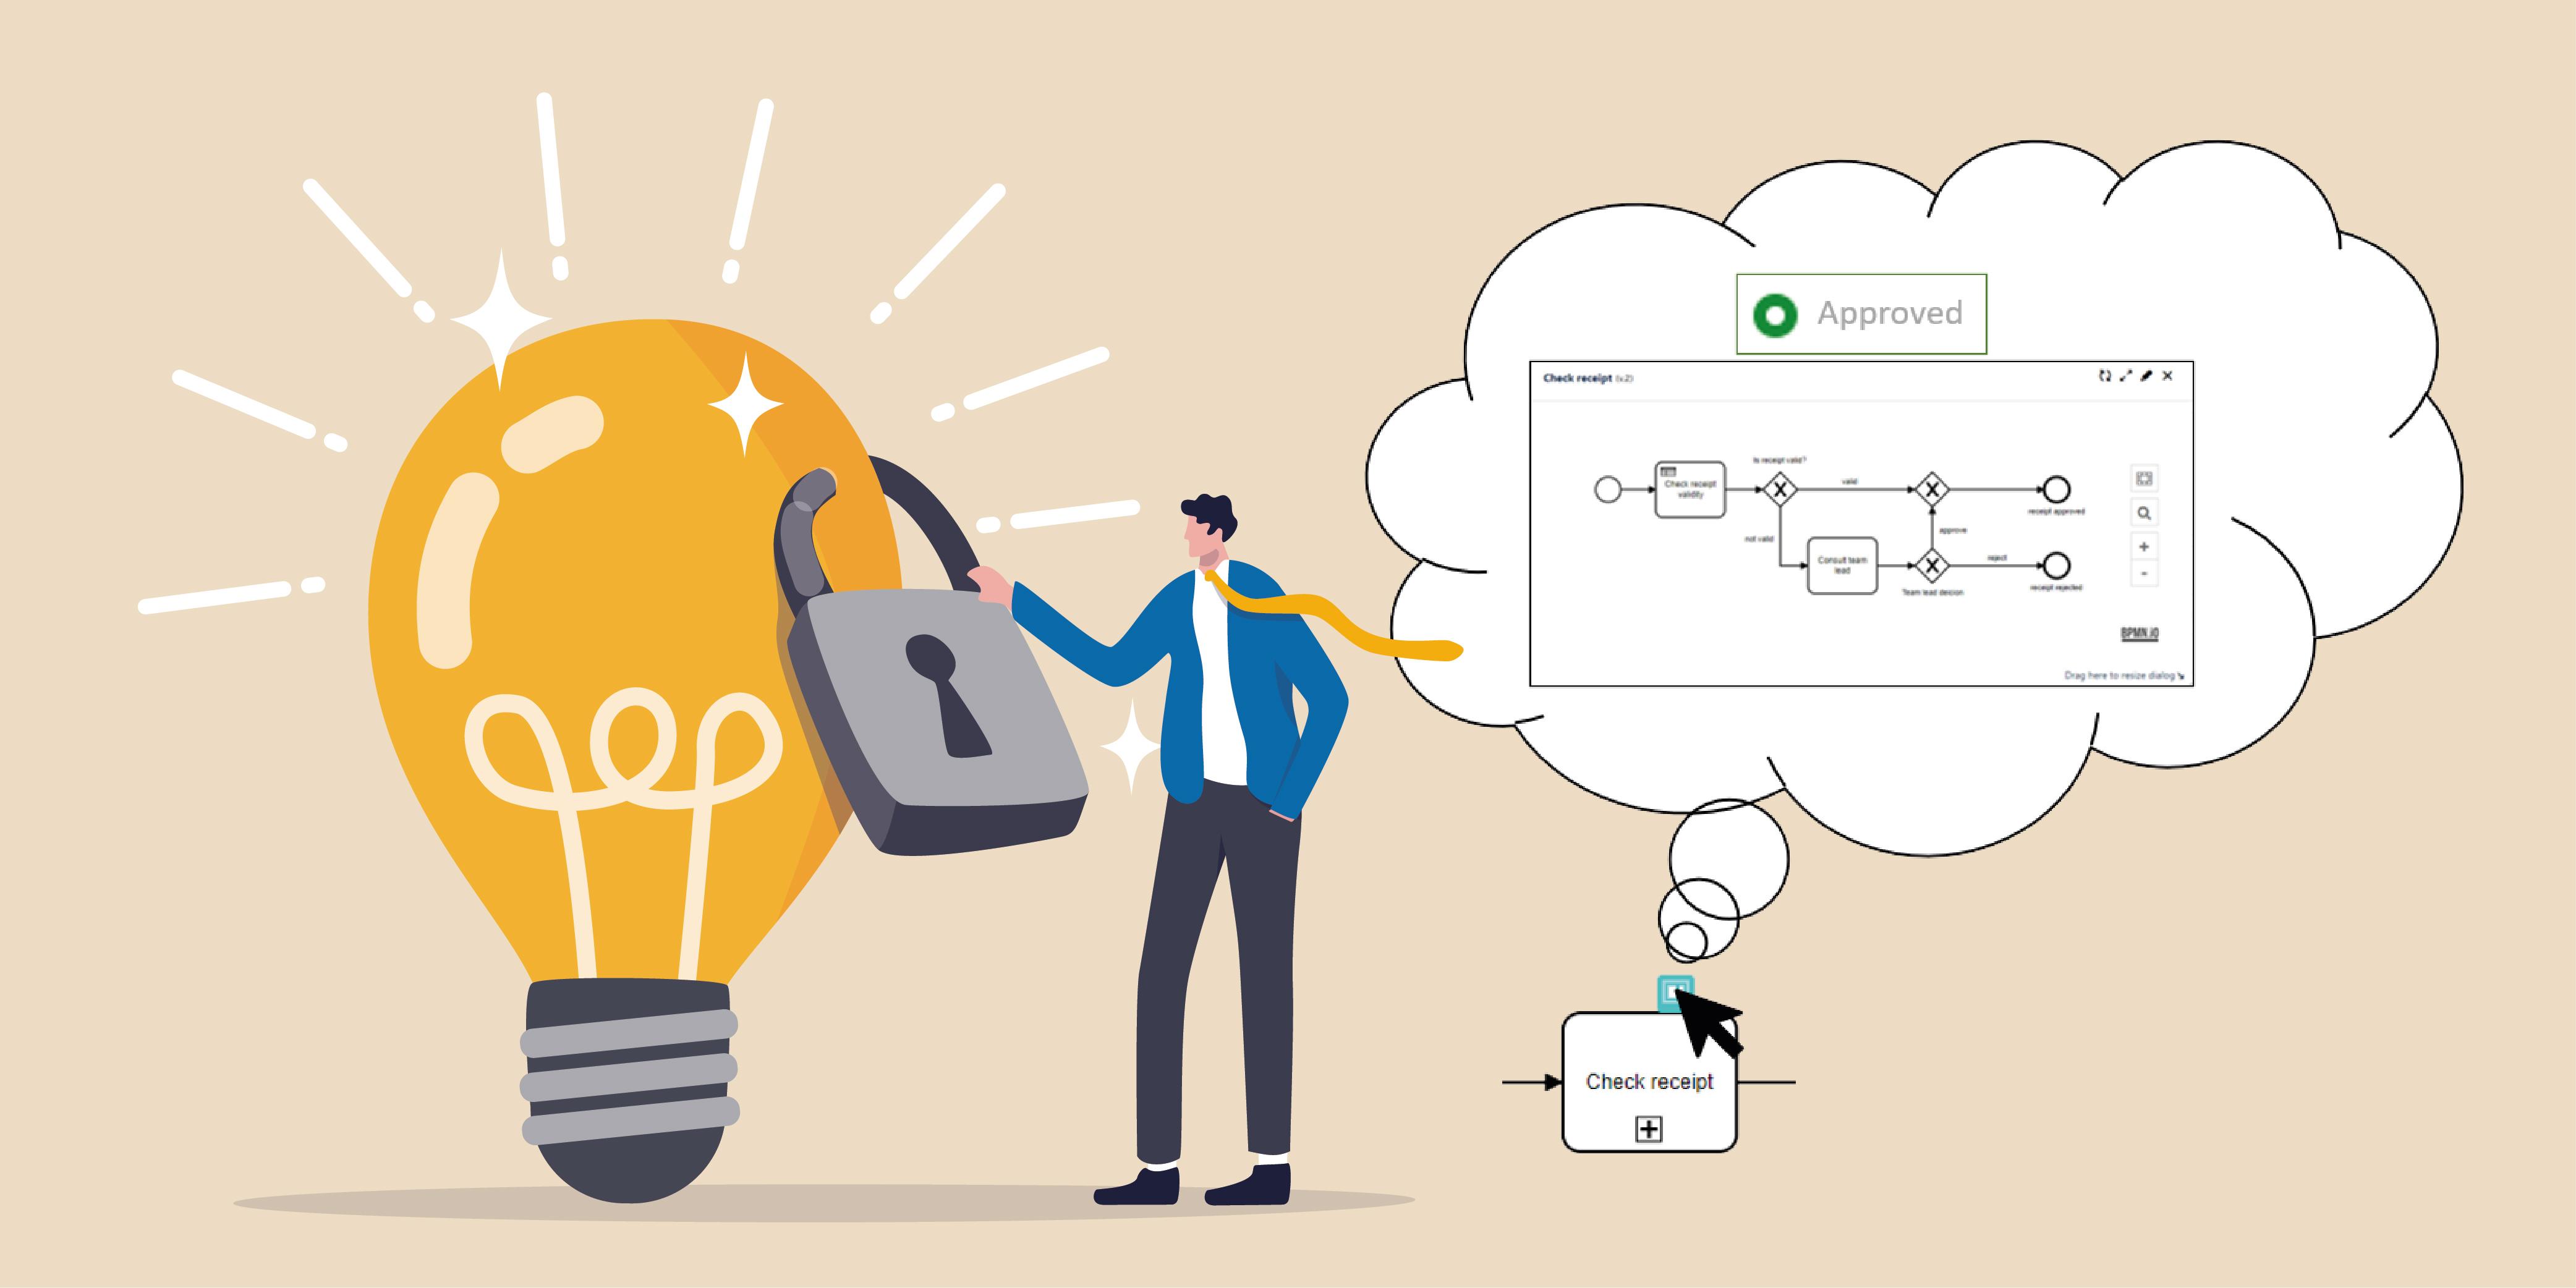 BPMN Modeler Enterprise now integrates with Comala Workflows